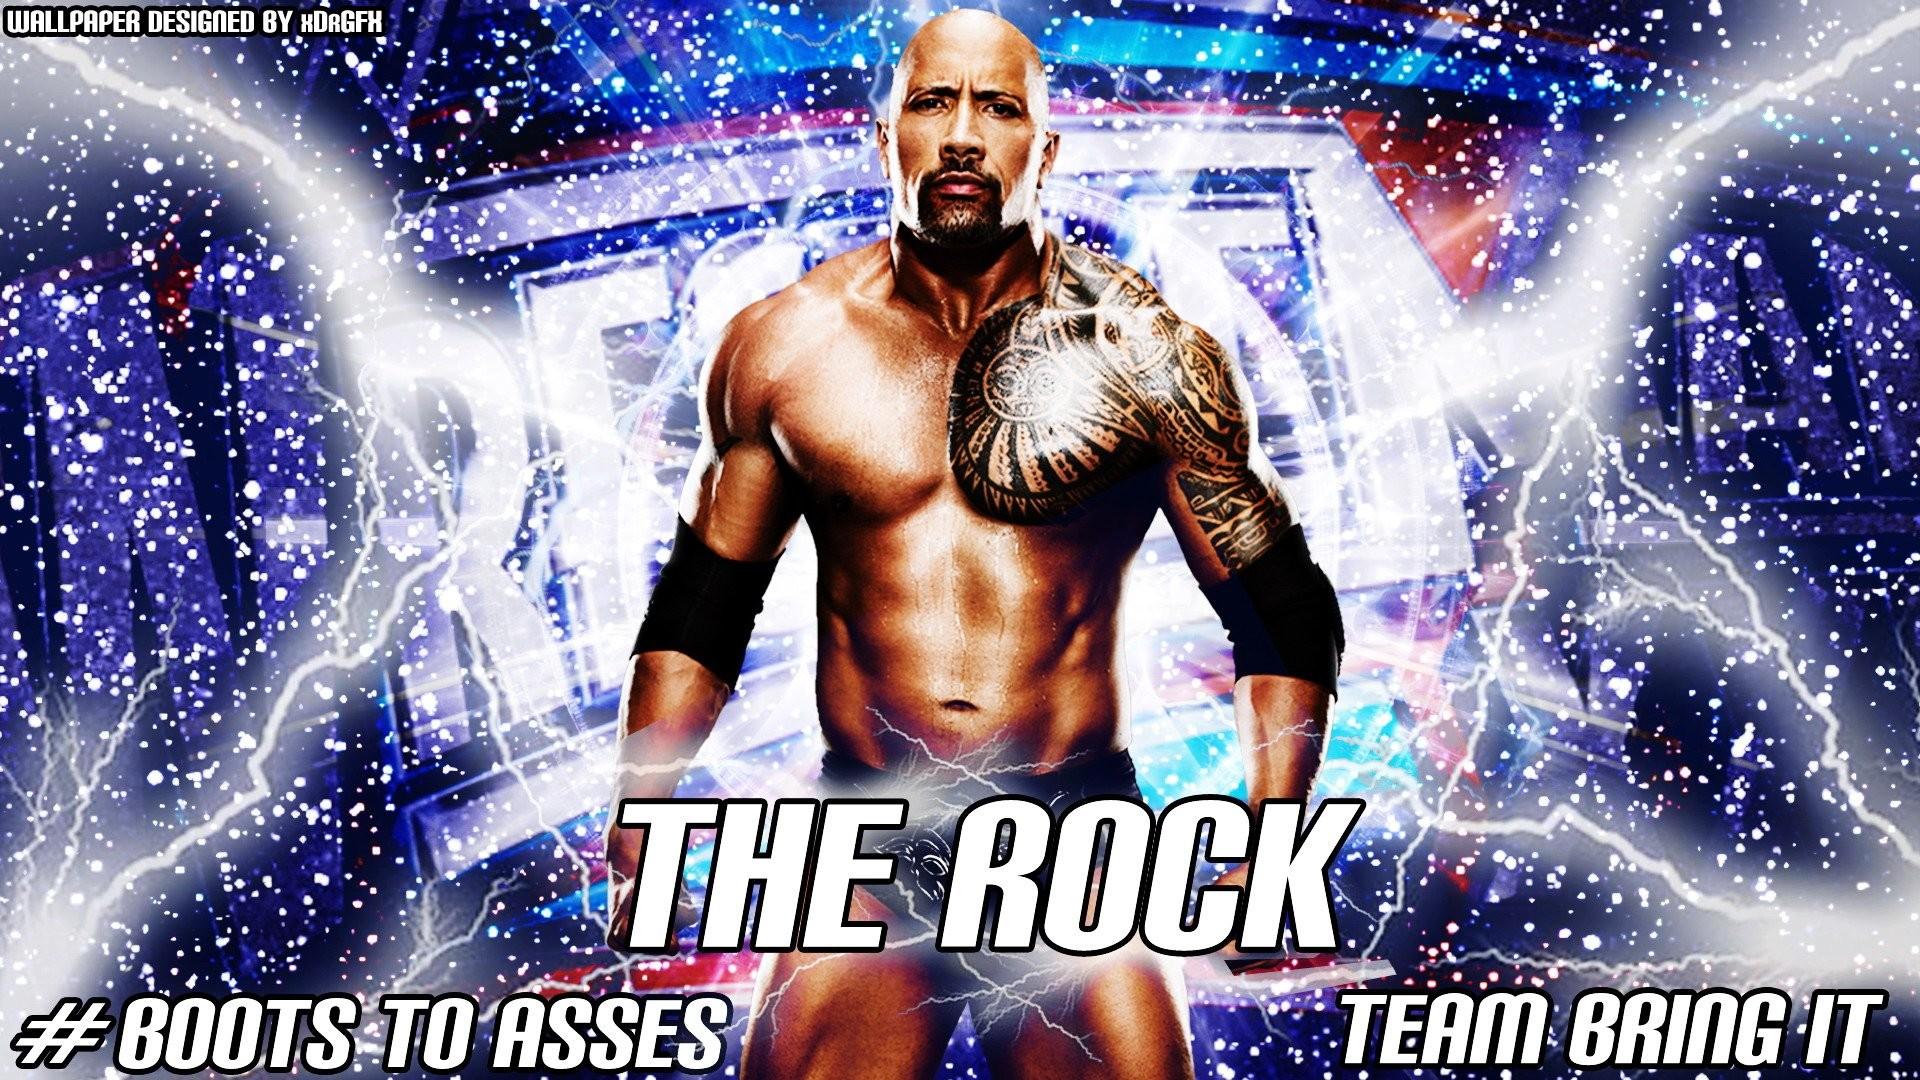 wwe | WWE 1024×768 Wallpaper # 135 | AWESOME! | Pinterest | John cena, Wwe  wallpapers and Nxt divas